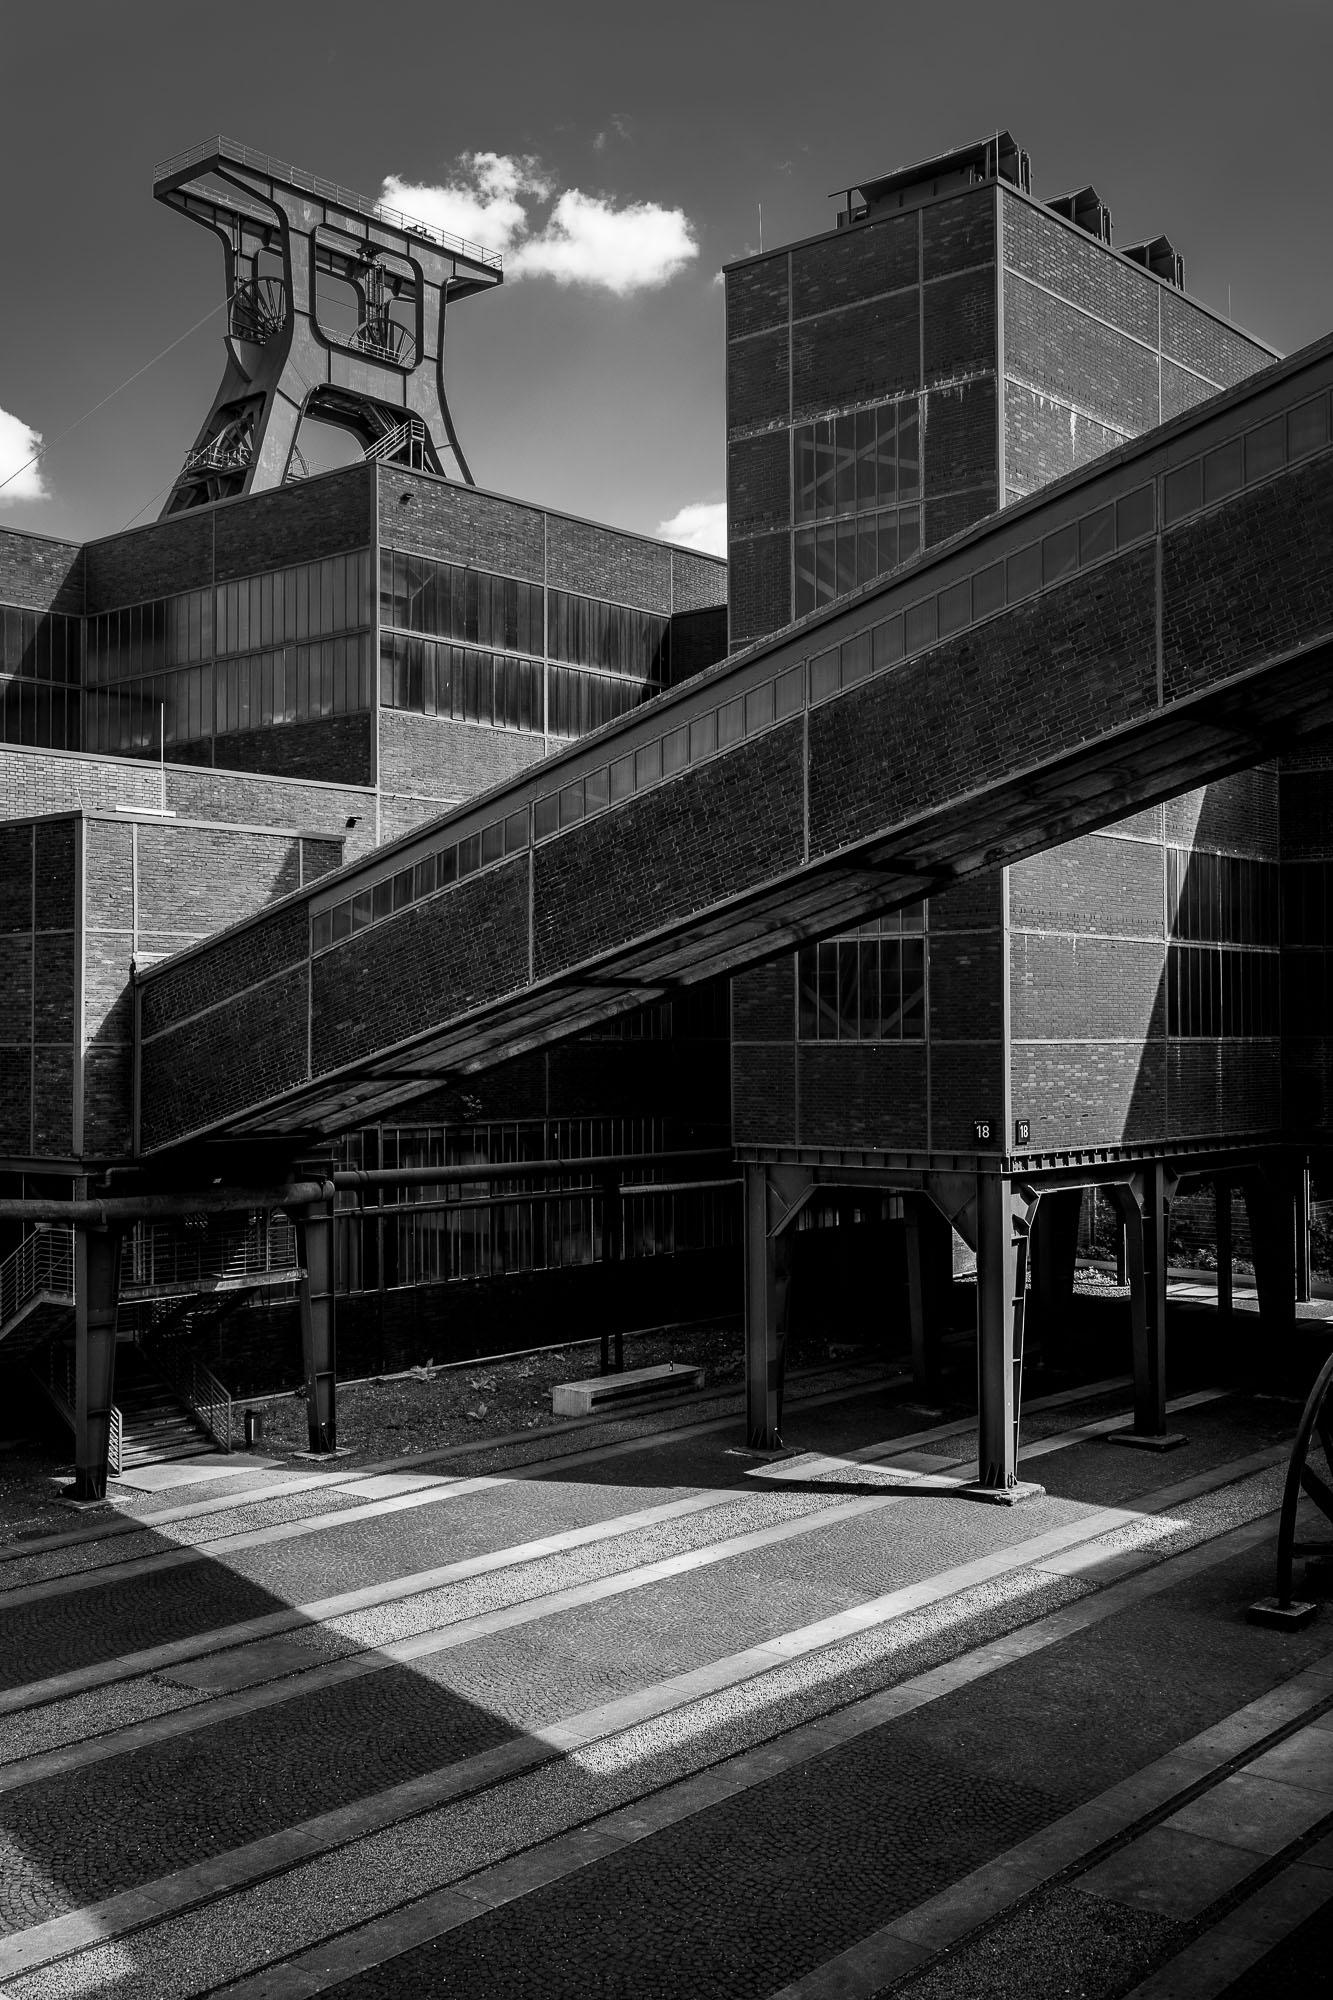 Zeche Zollverein industrial complex